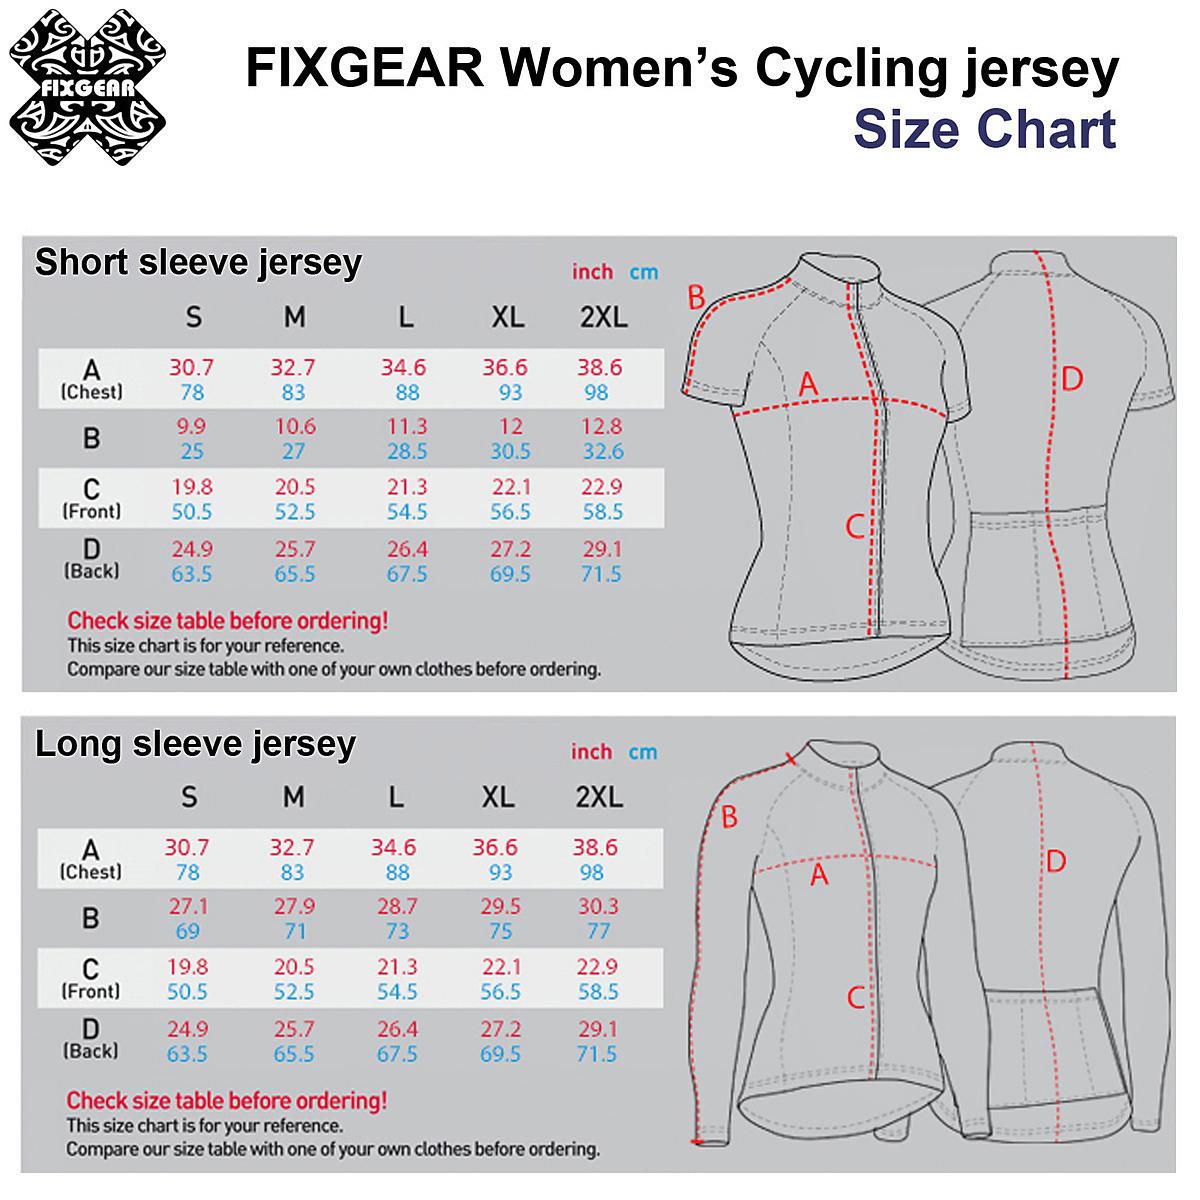 New womens cycling jersey size chartg also chart rh fixgearmall